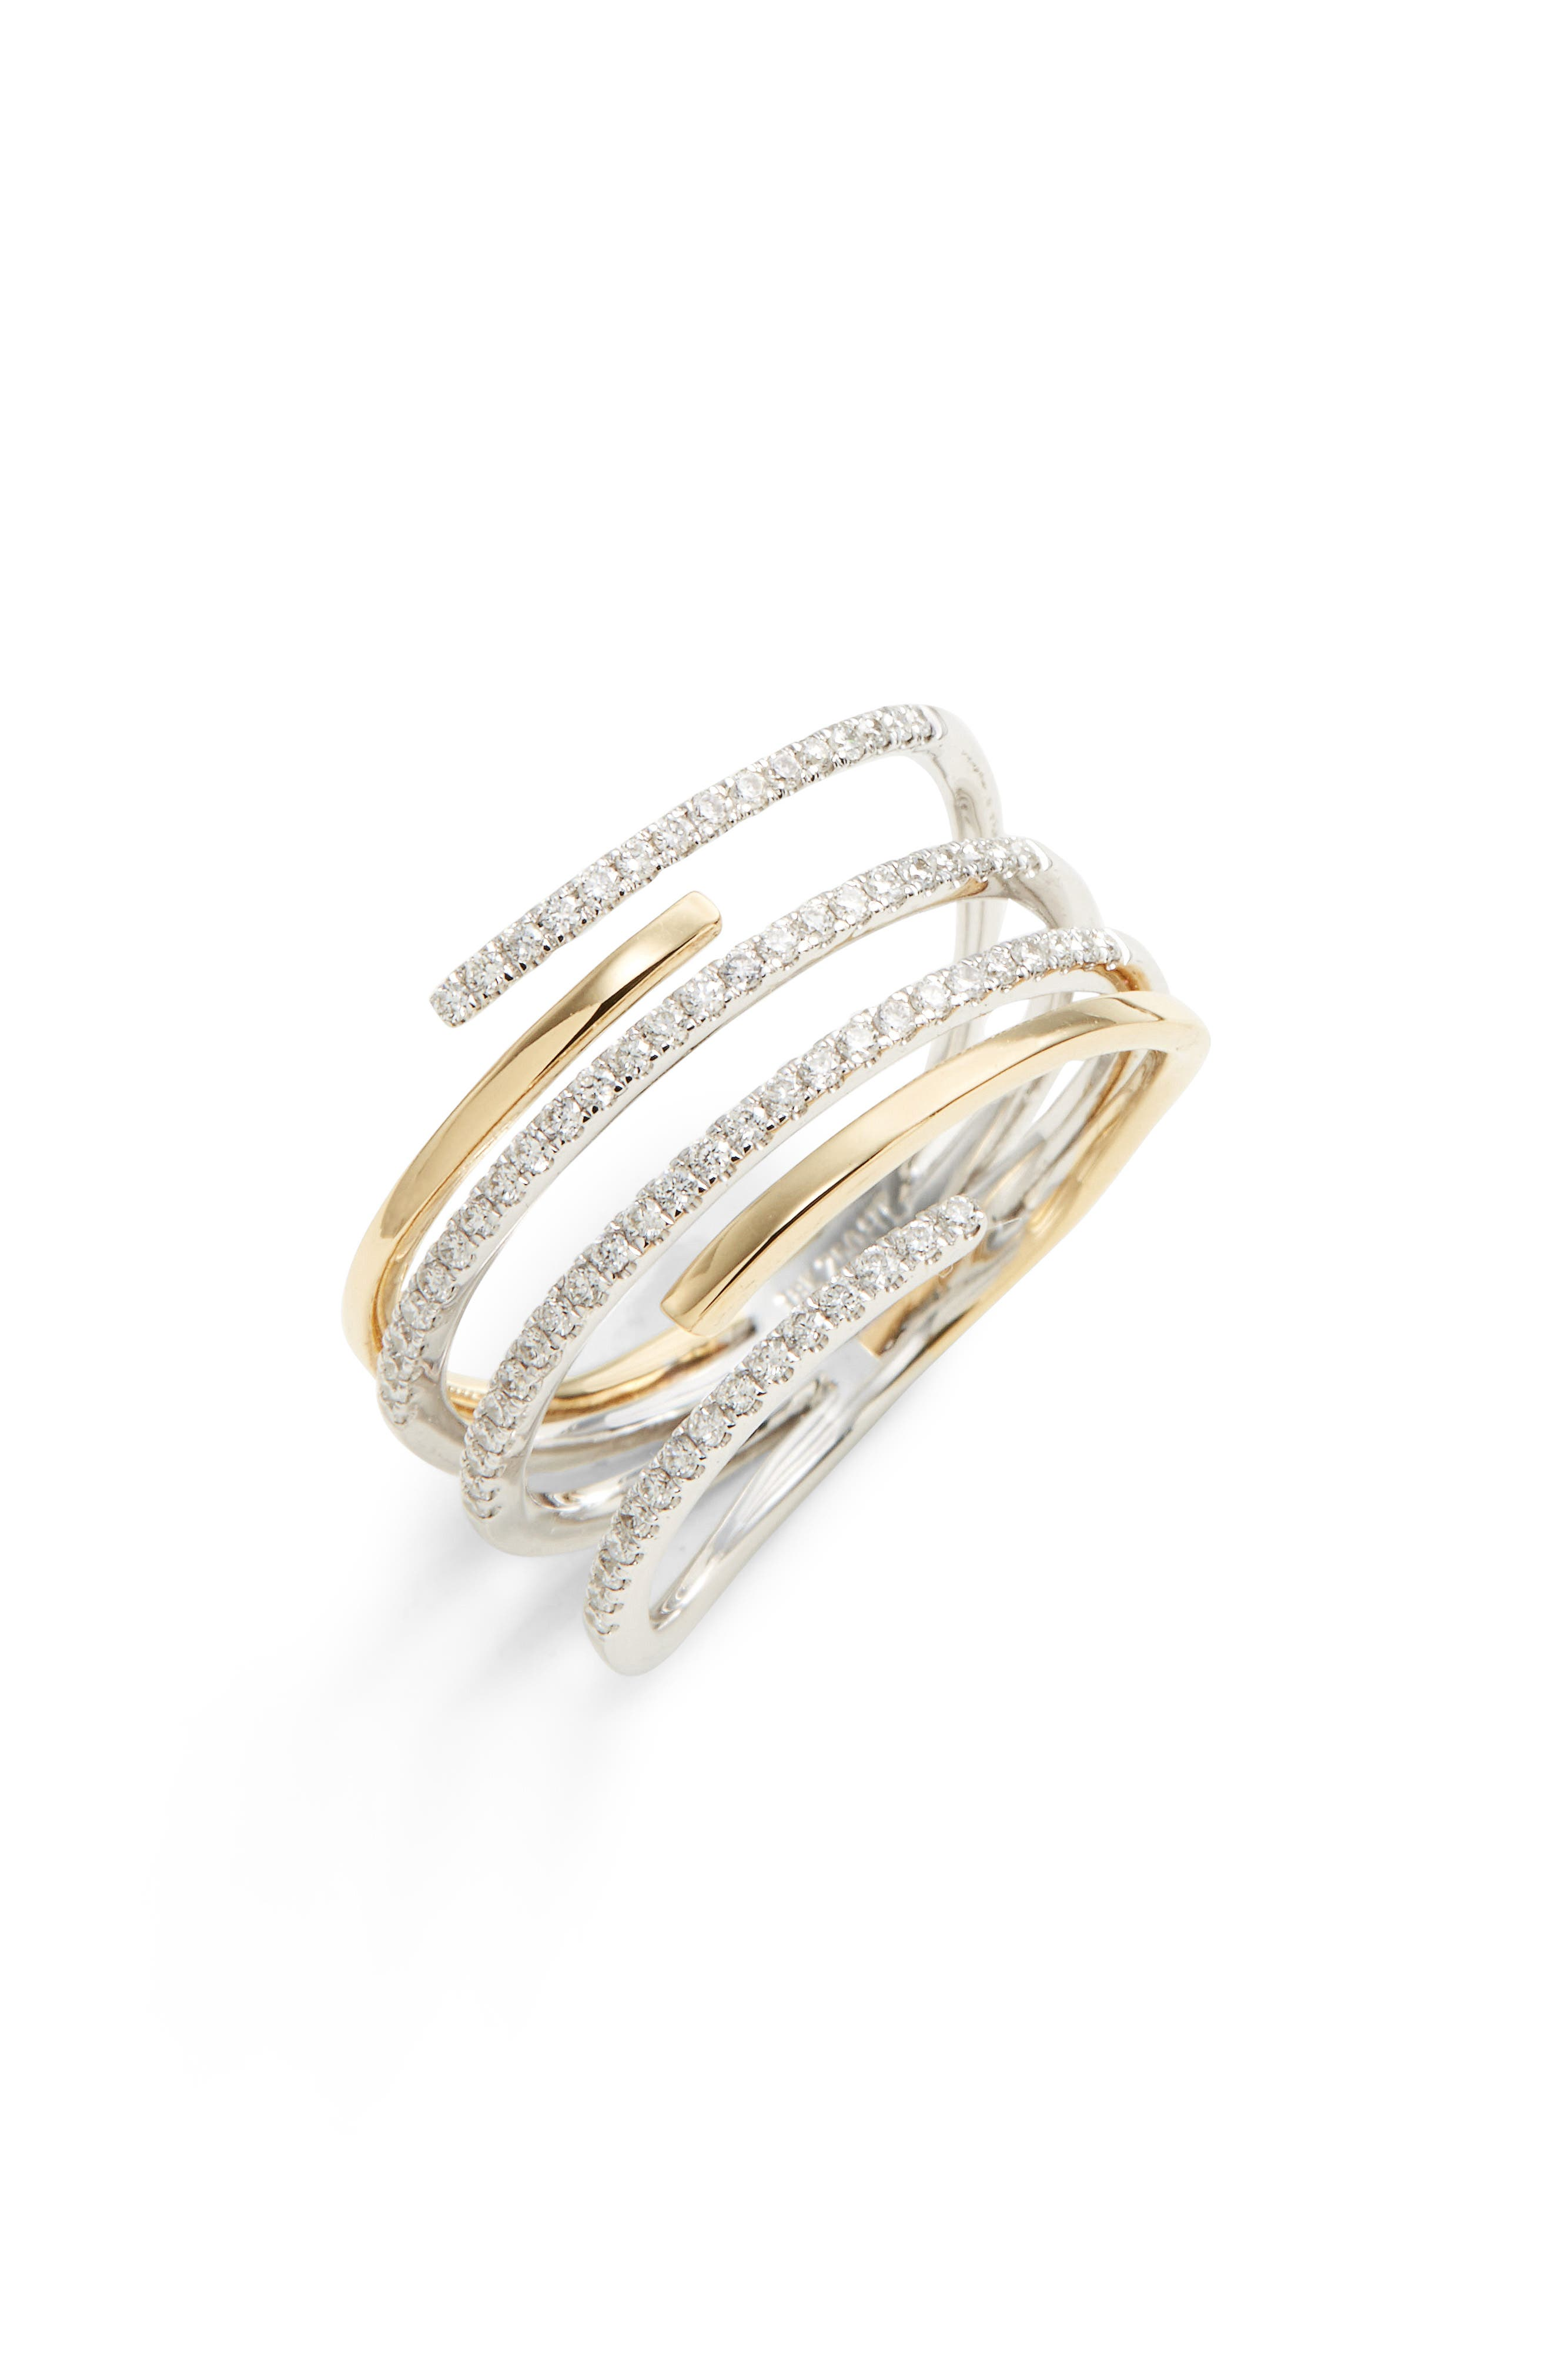 Alternate Image 1 Selected - Bony Levy Openwork Diamond Ring (Nordstrom Exclusive)